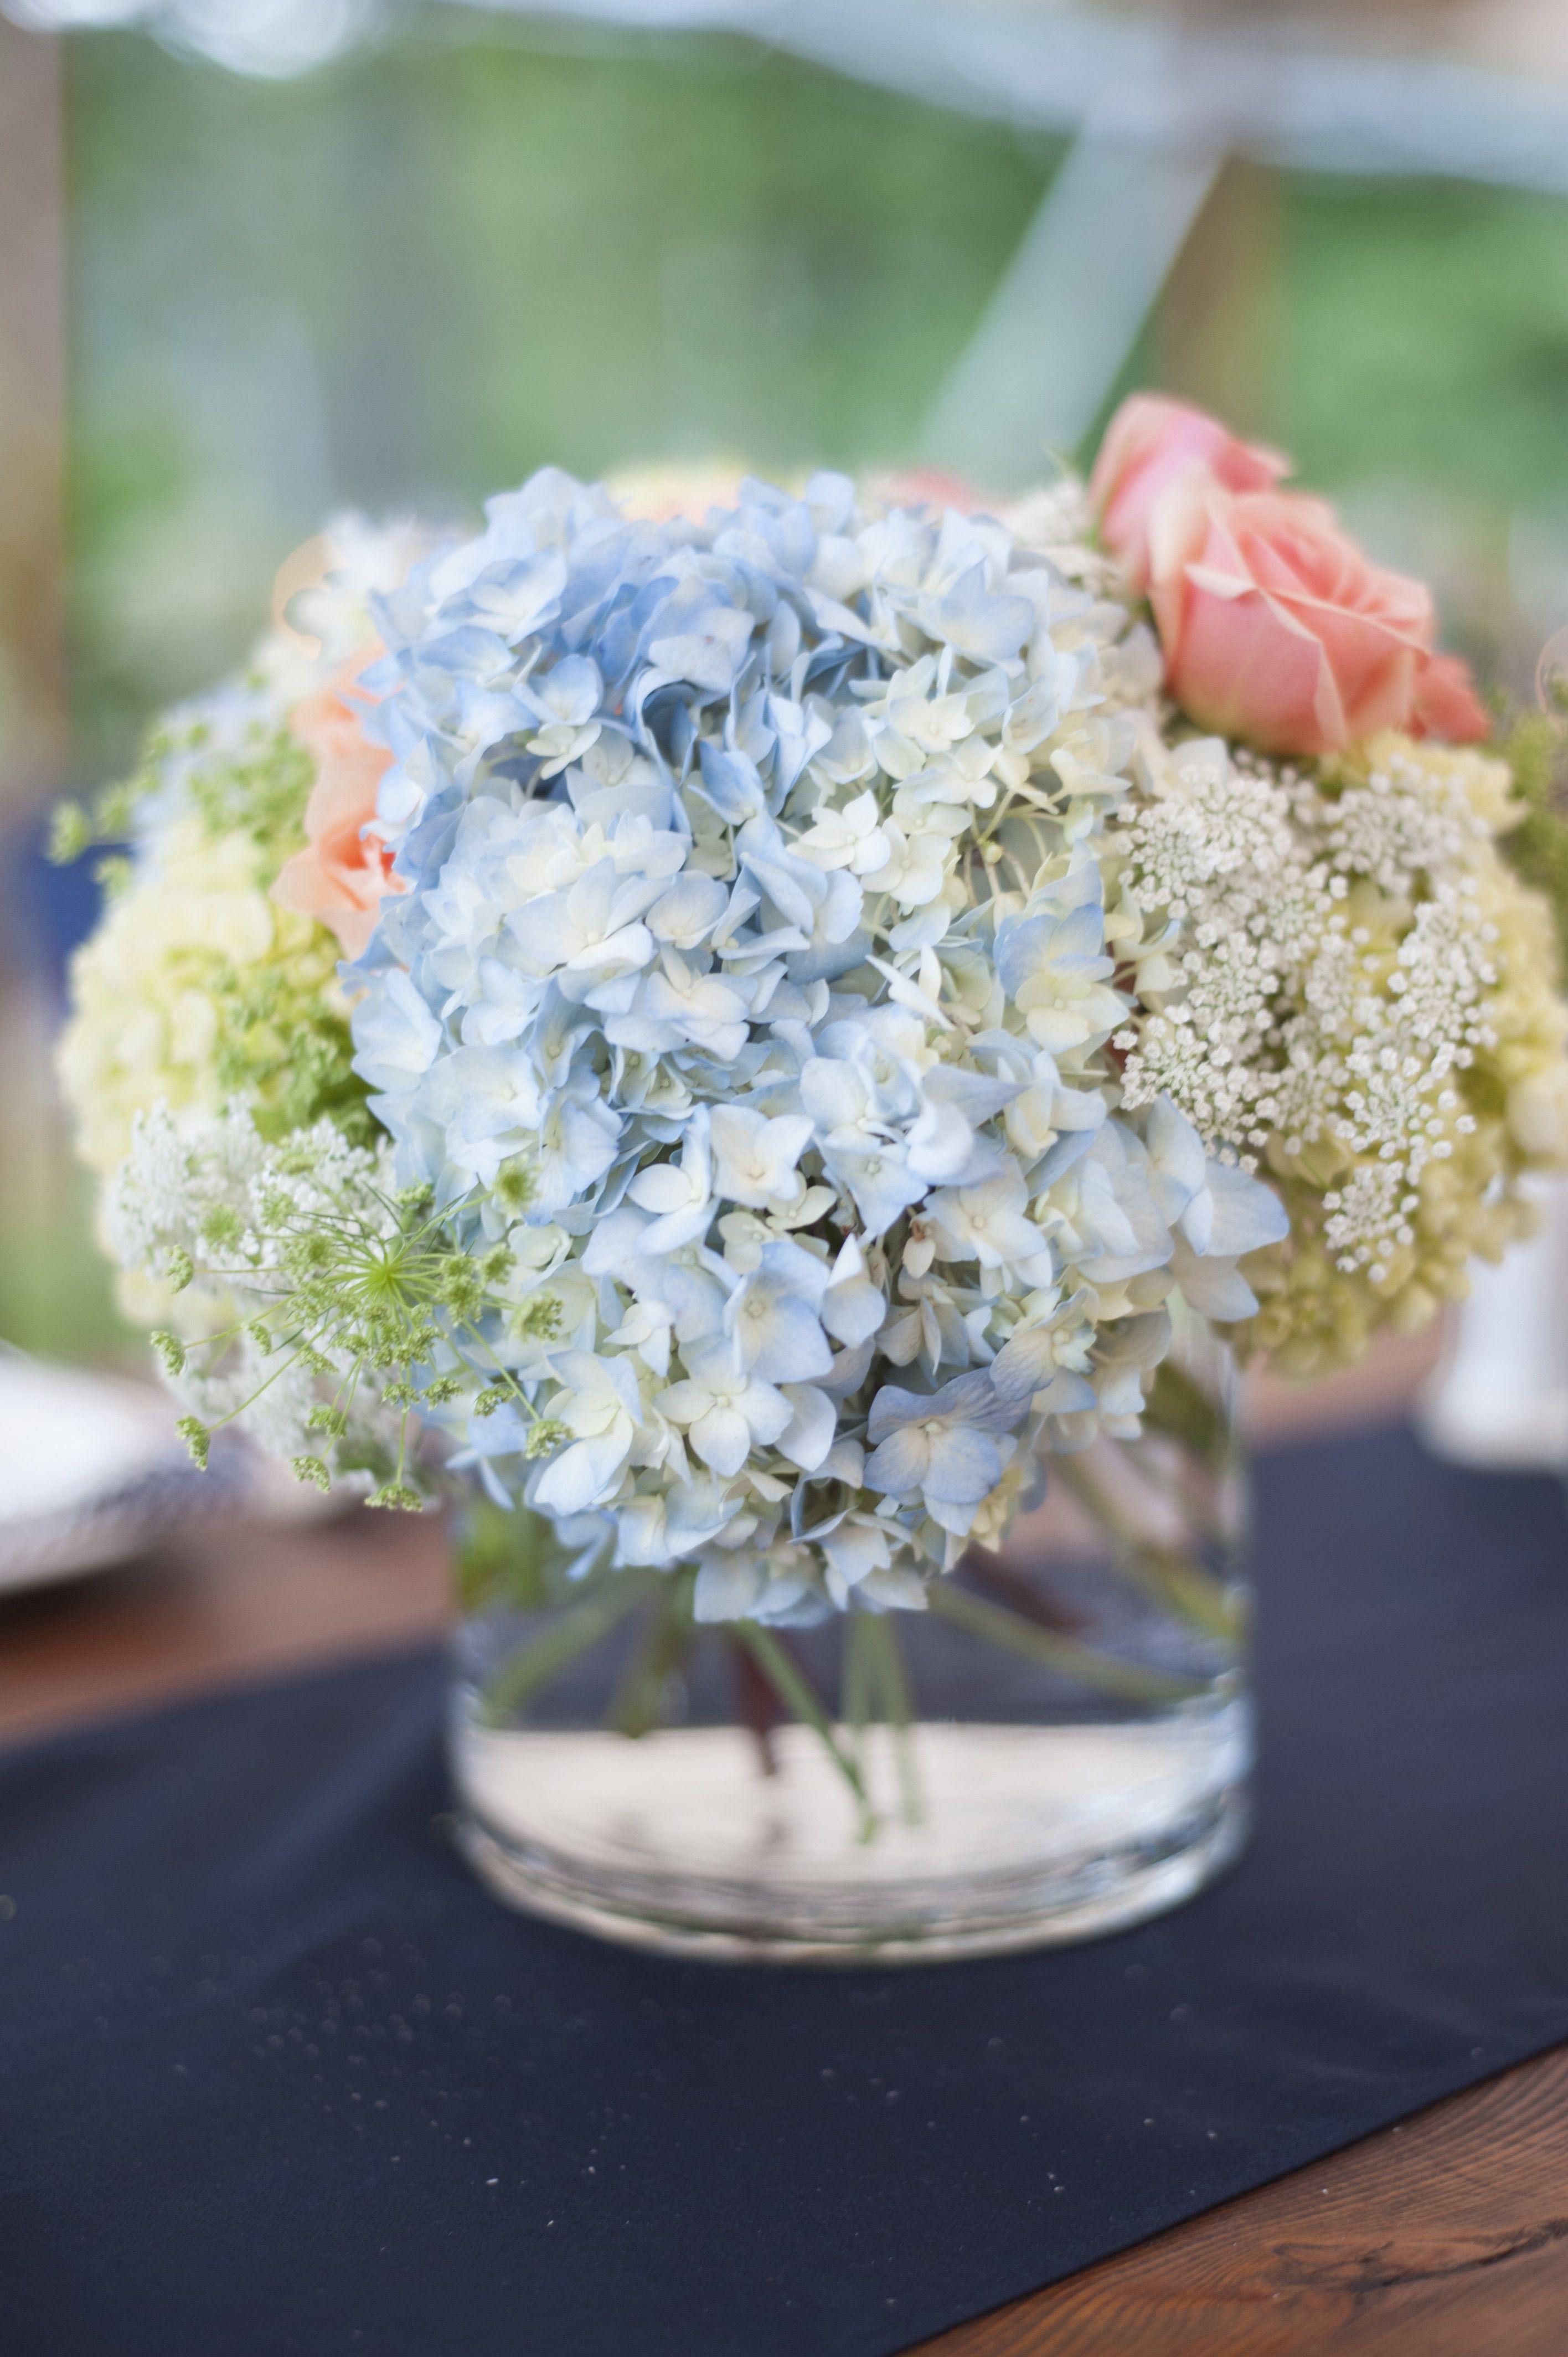 Photography: Brea McDonald Photography - breamcdonald.com  Read More: http://www.stylemepretty.com/little-black-book-blog/2014/06/17/maine-seaside-cottage-wedding/